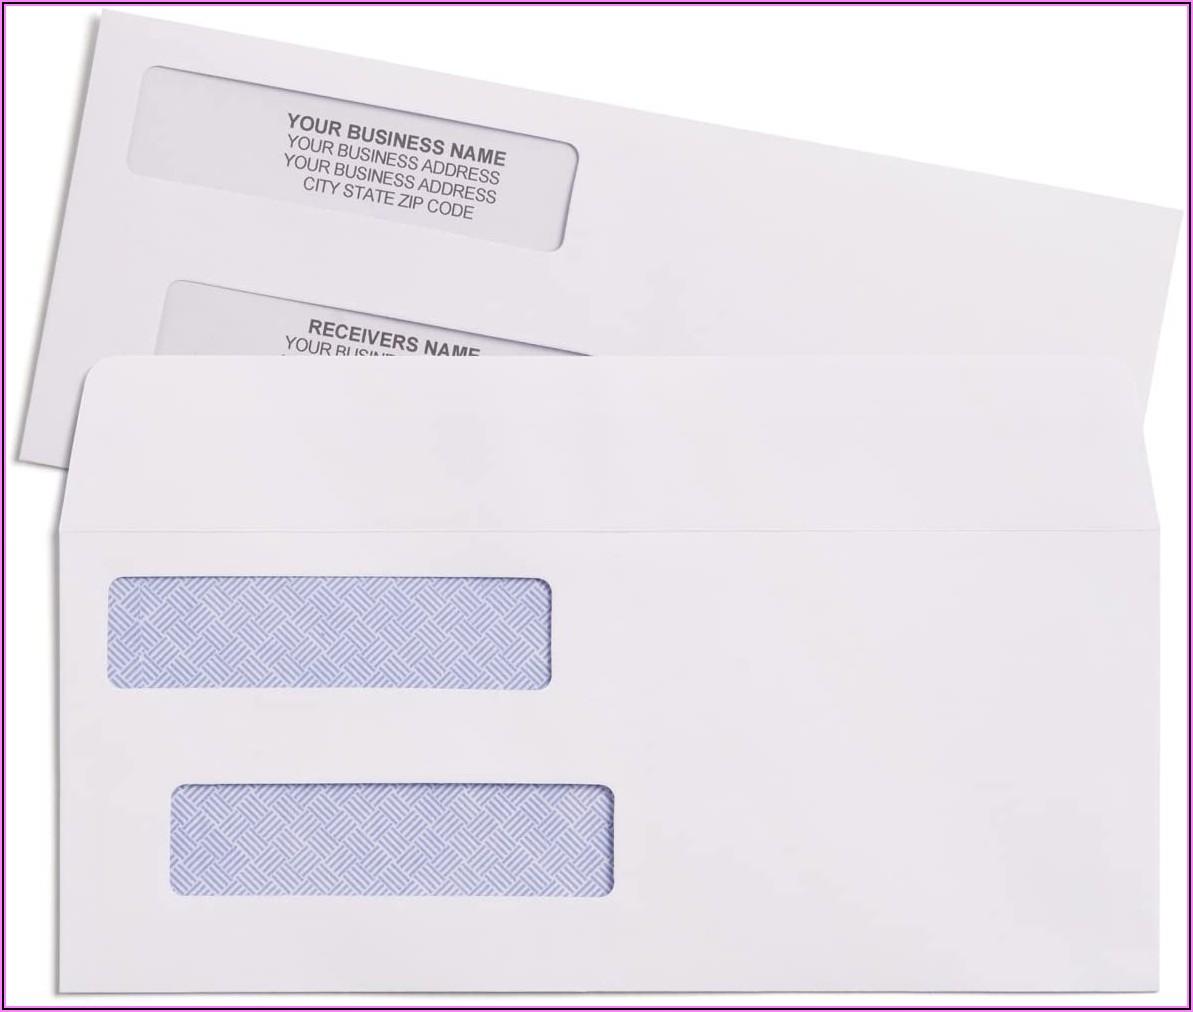 Quickbooks Check Envelopes Size